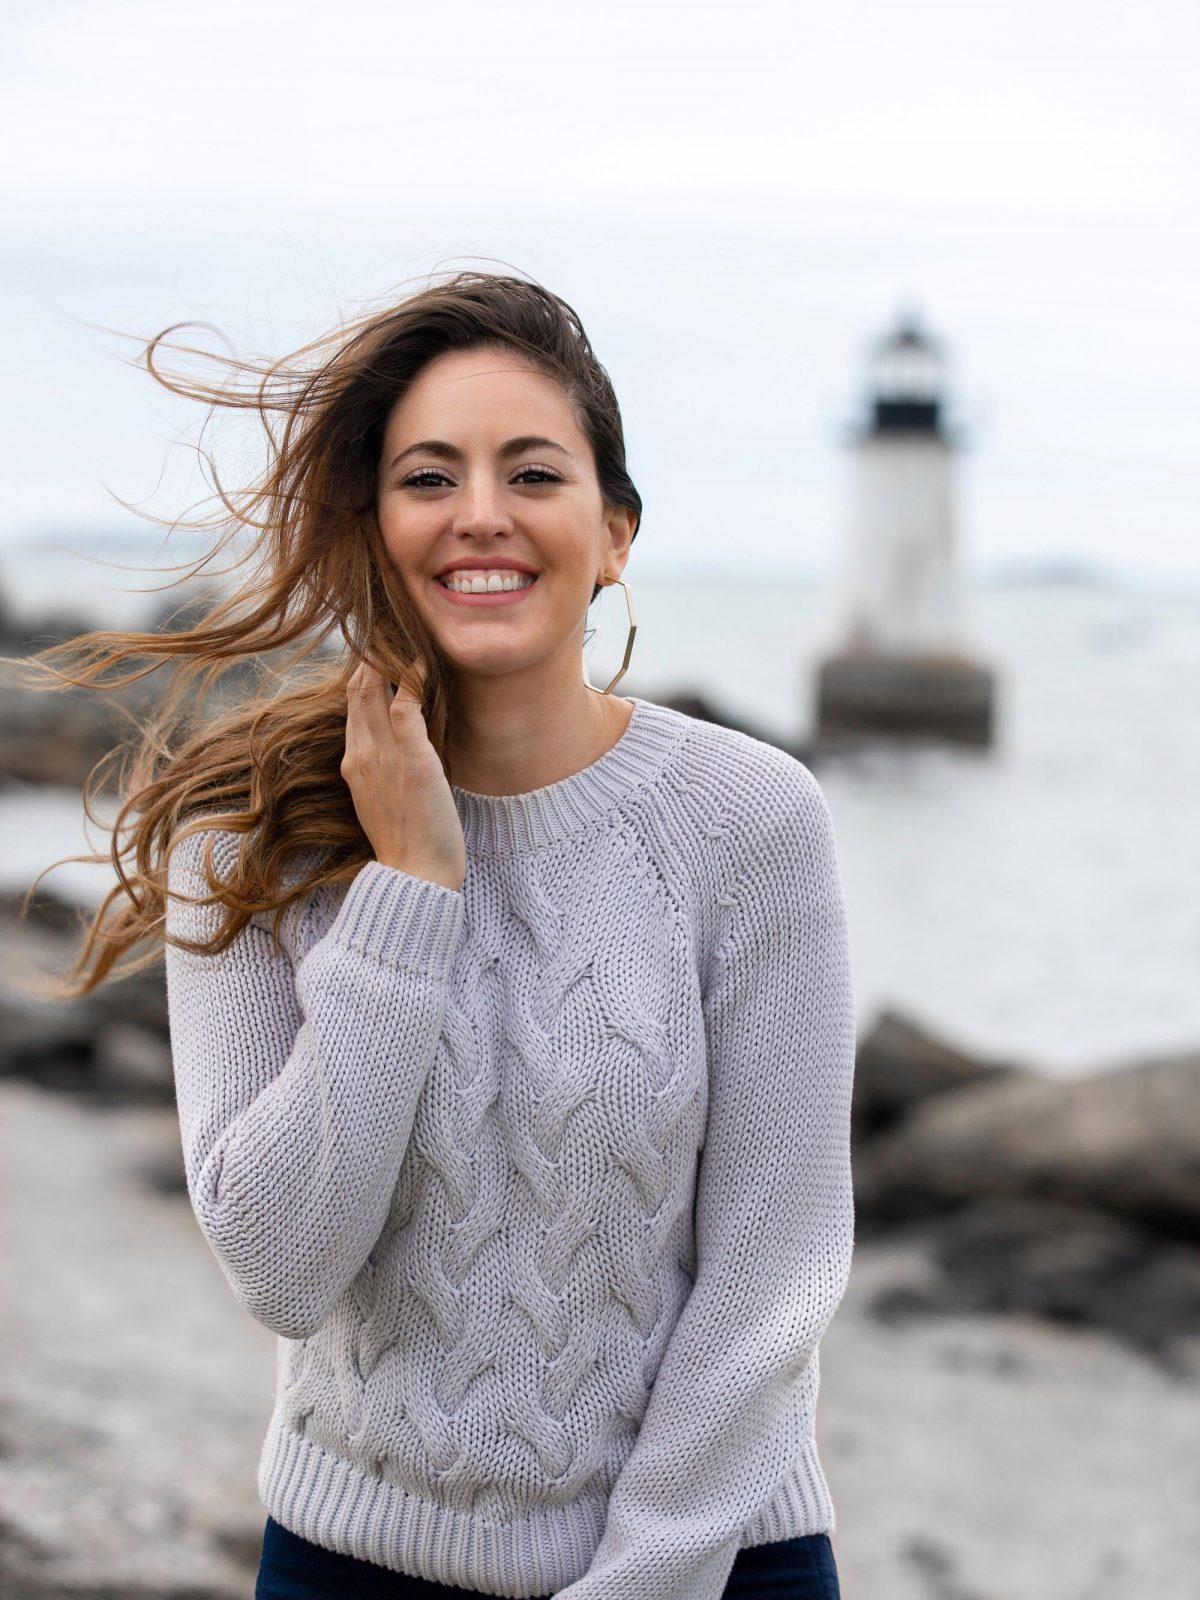 marblehead, Massachusetts, coastal new england, L'Agence - Solana Flared Velvet Pants in Navy, winter island, autumn in new england